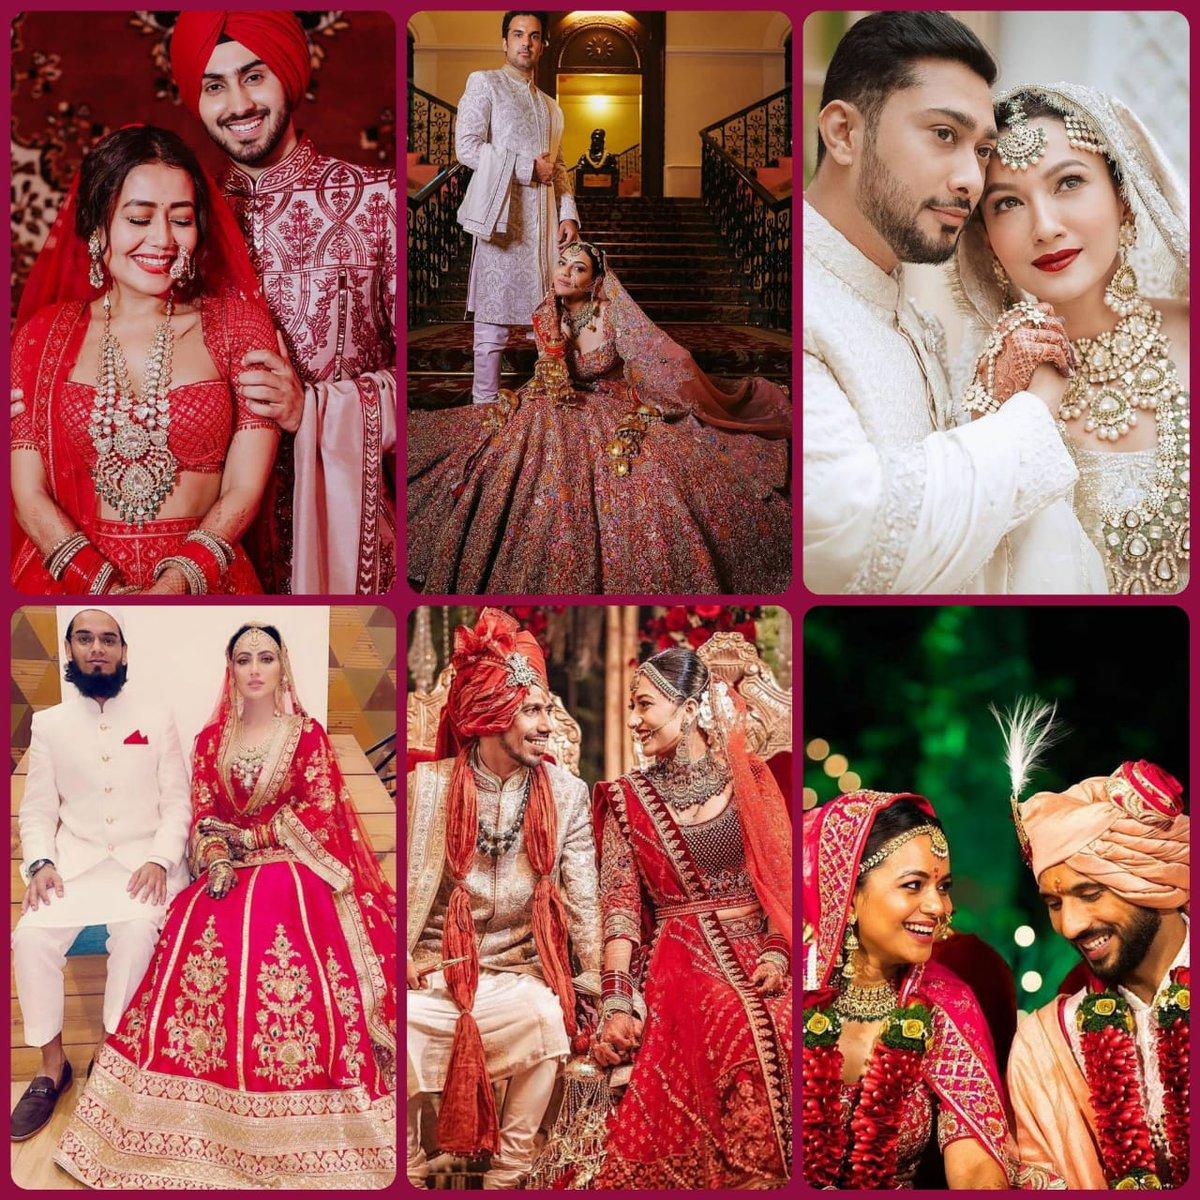 B-town Celebs Viral Weddings in 2020. Explore your LOVE ❤️❤️❤️  #Bollywood #PunitPathak #BollywoodMarriage #BigFatMarriage #NehuDaVyah #NehaKakkar #GautamKitchlu #RohanpreetSingh #YuzvendraChahal #Yuzi #DhanaSaidYuz #dhanashreeverma  #KajalAggarwal